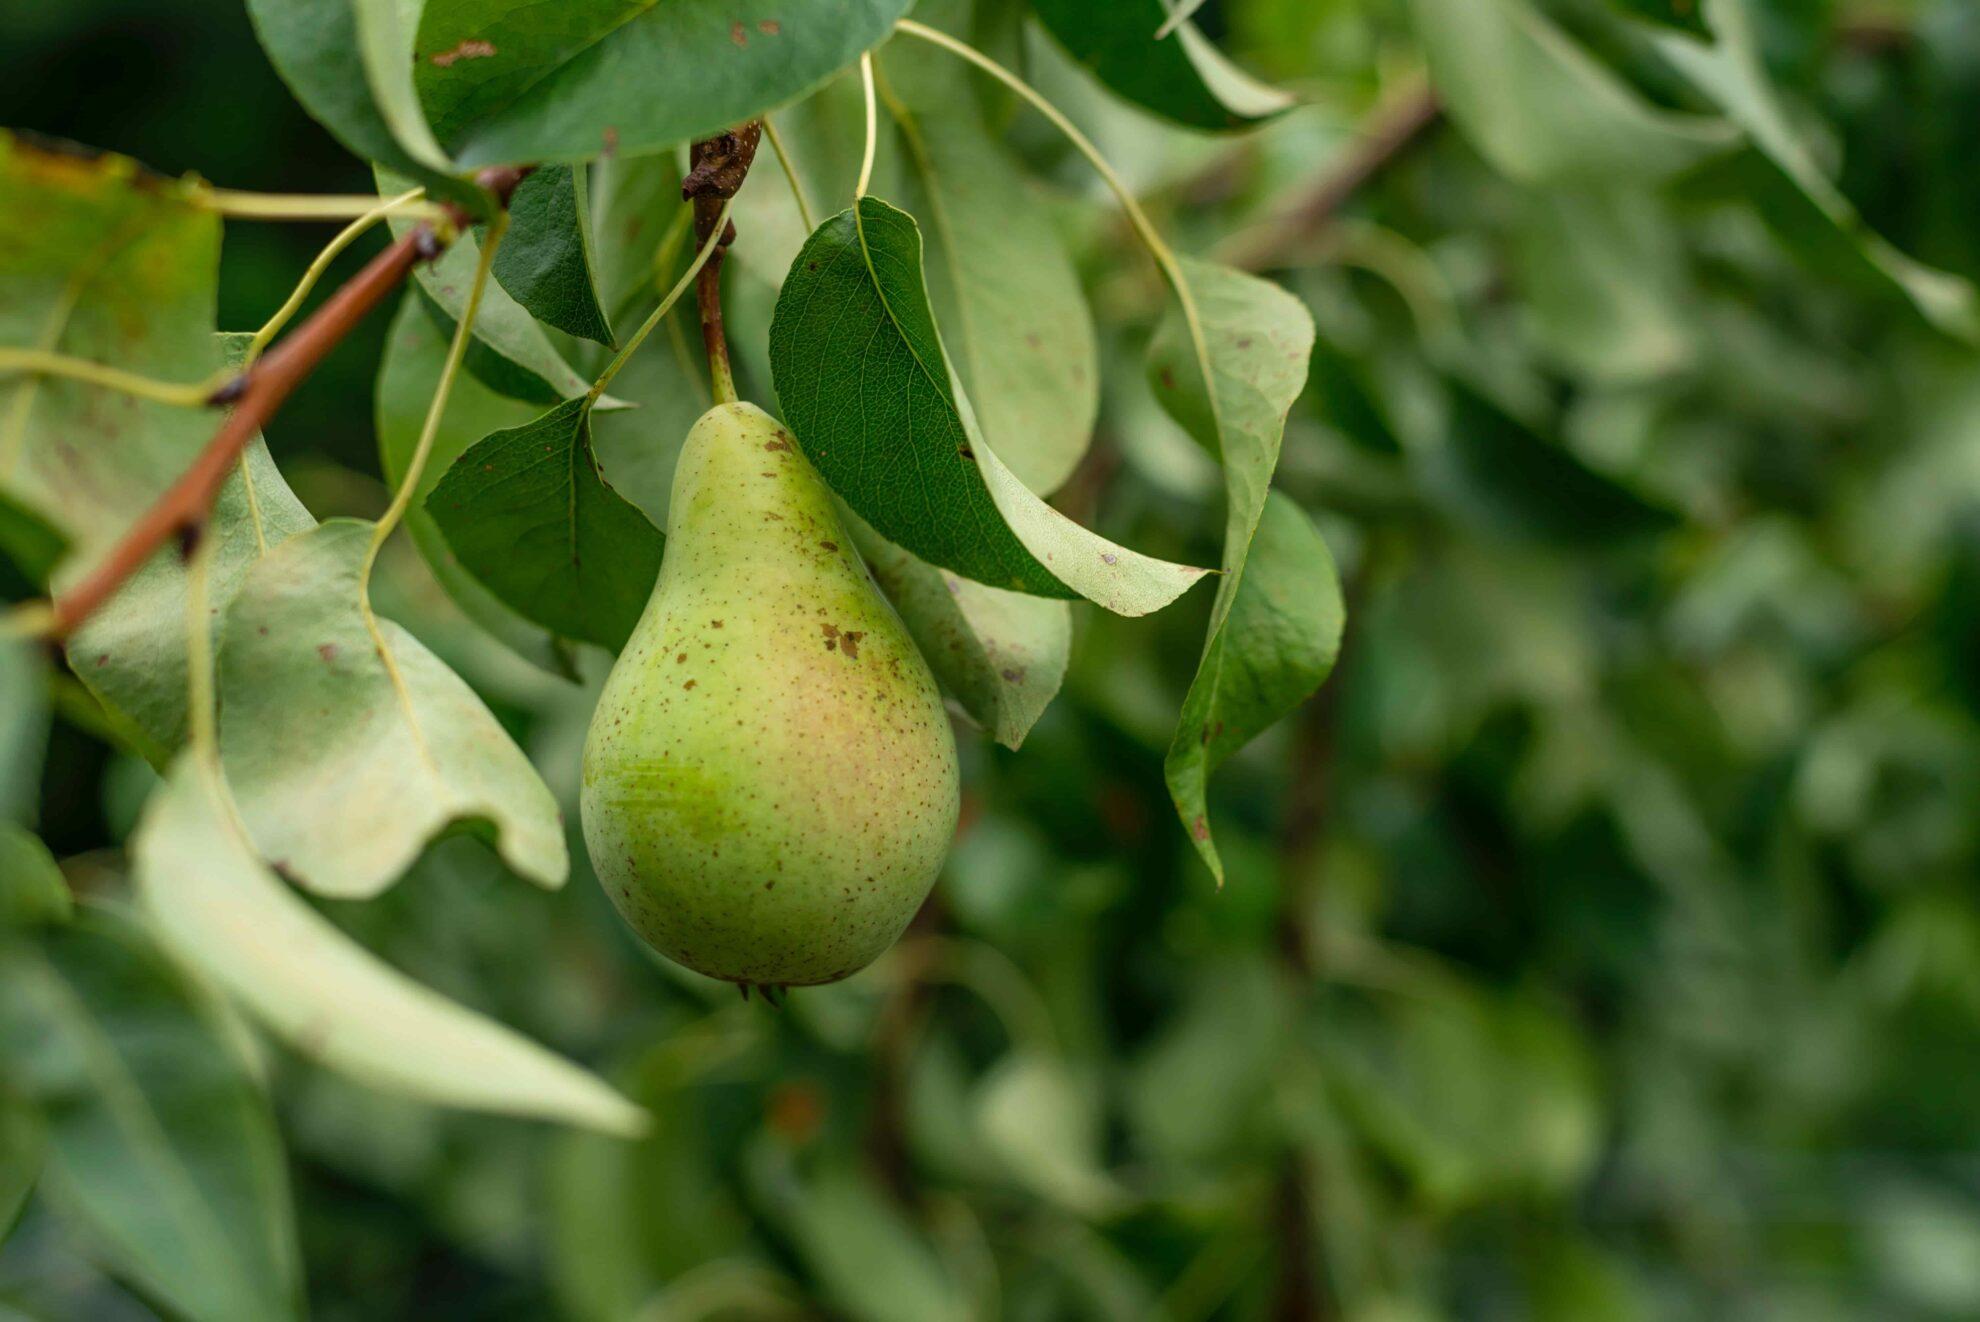 Pears_Pear_Tree